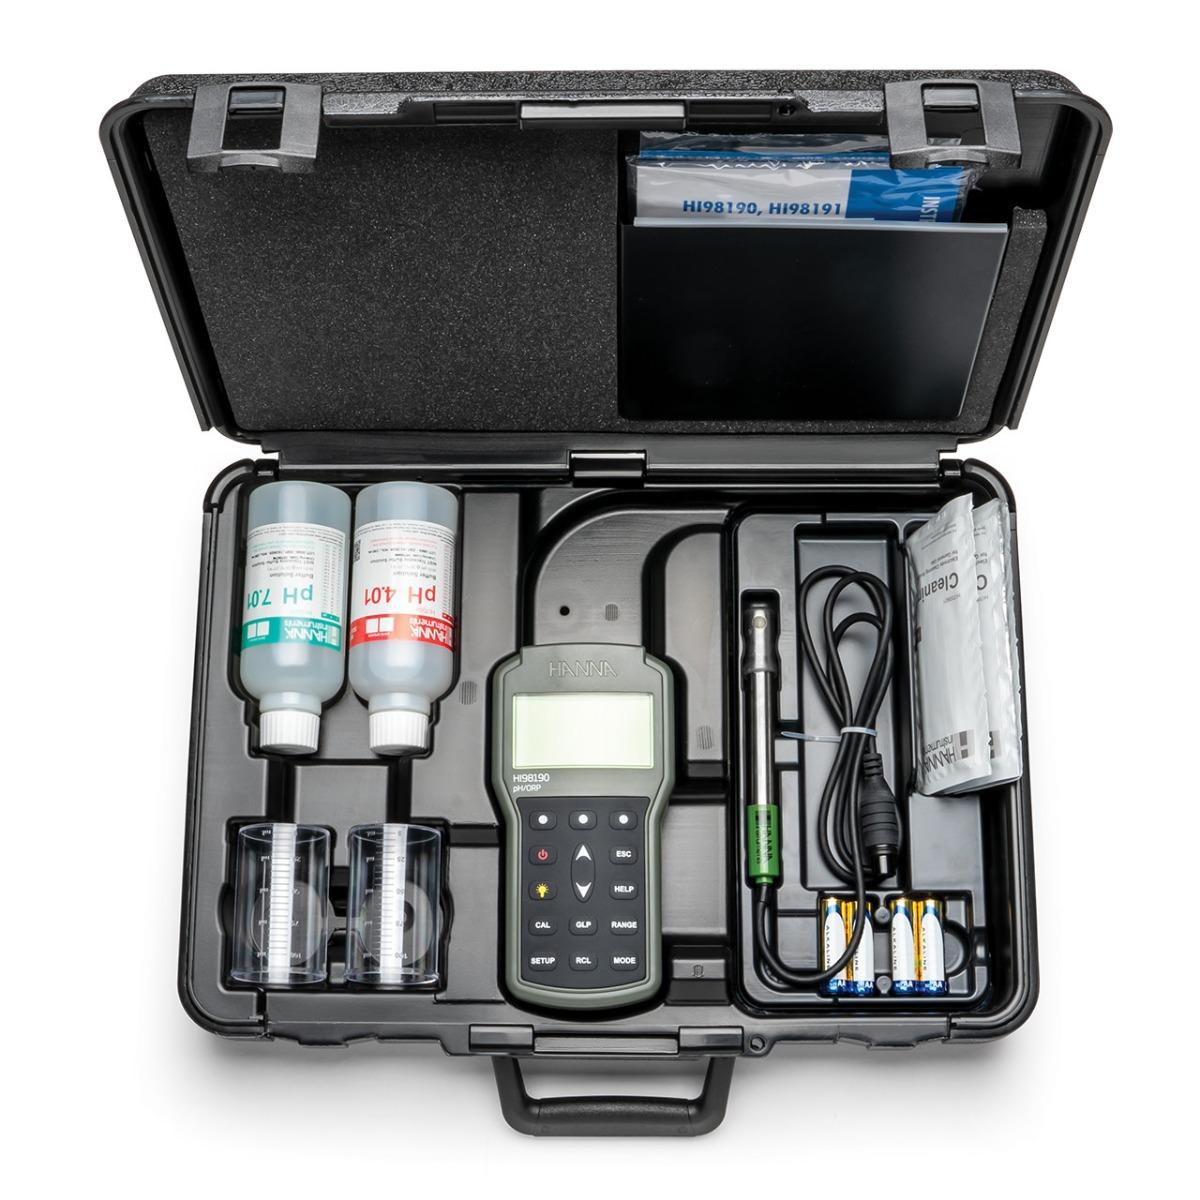 10 engranajes para ropa de algod/ón//hilo//lana DM200T Huanyu Medidor de humedad profesional textil Analizador de contenido de agua h/úmeda con pantalla digital//sensores de metal